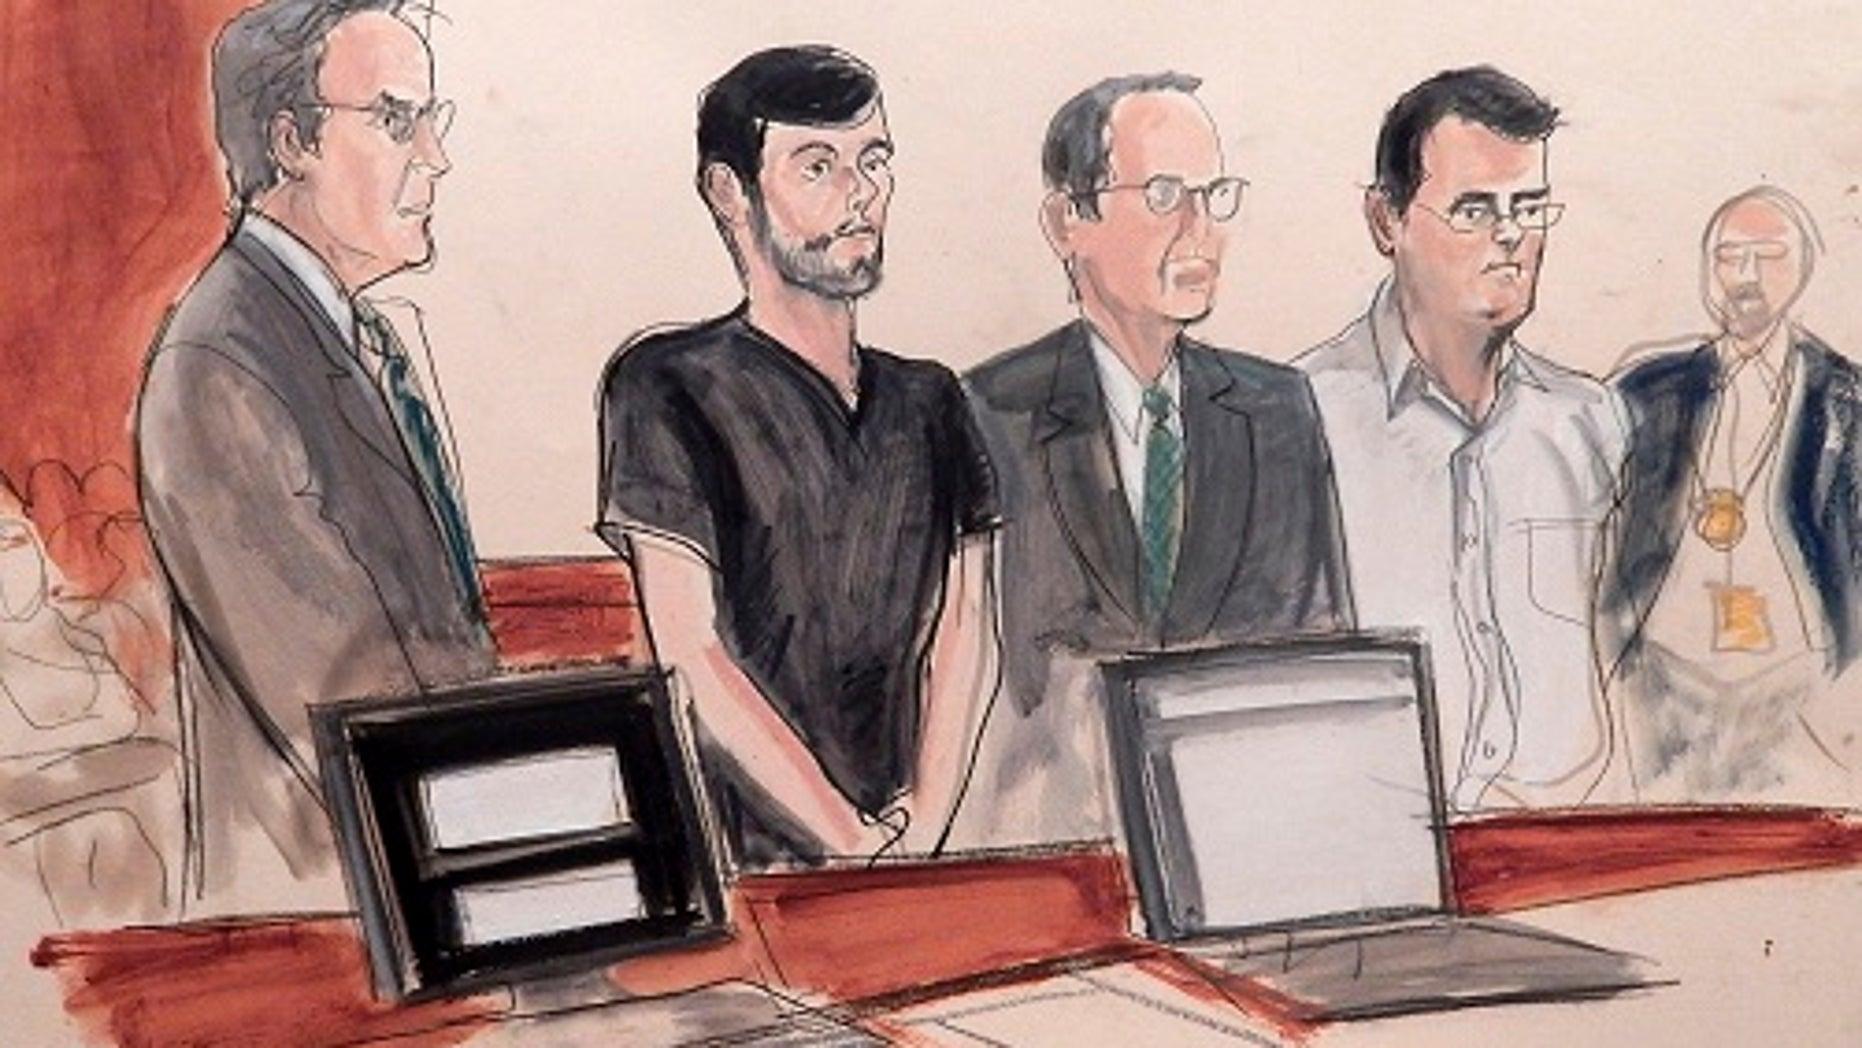 From left, defense attorney Baruch White, pharmaceutical entrepreneur Martin Shkreli, defense attorney Jonathan Sack and co-defendant Evan Greebel, appear in court in New York.